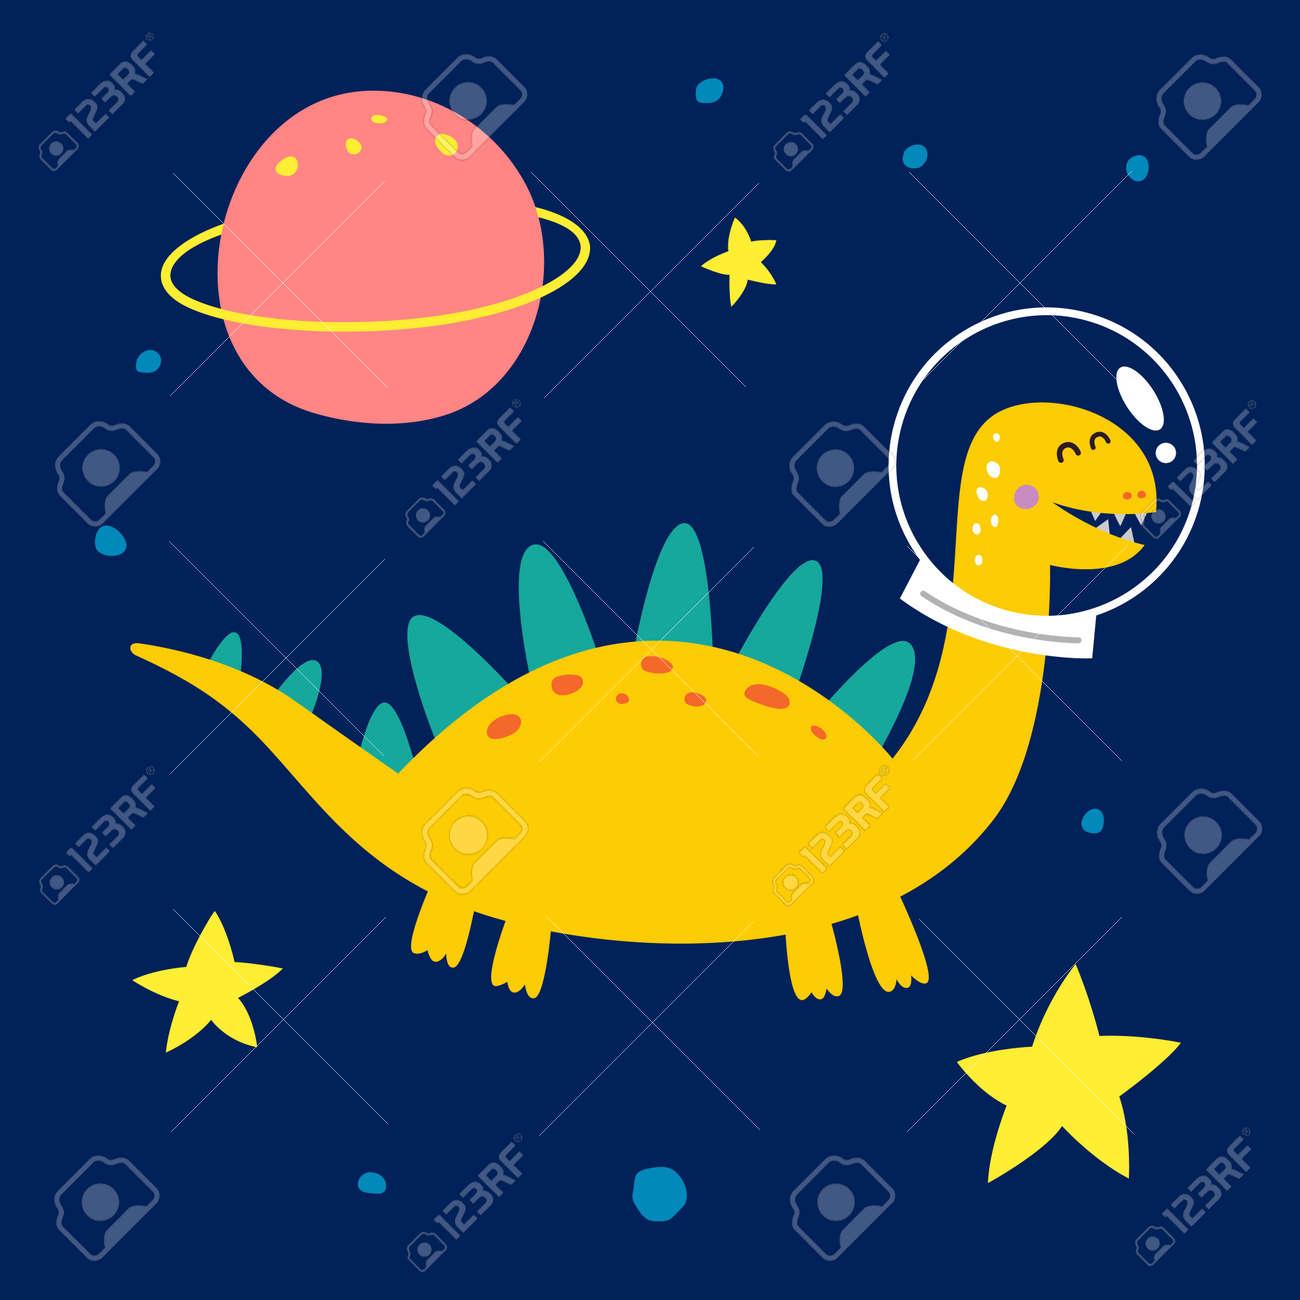 Space dinosaur, vector illustration for children fashion. - 169772194